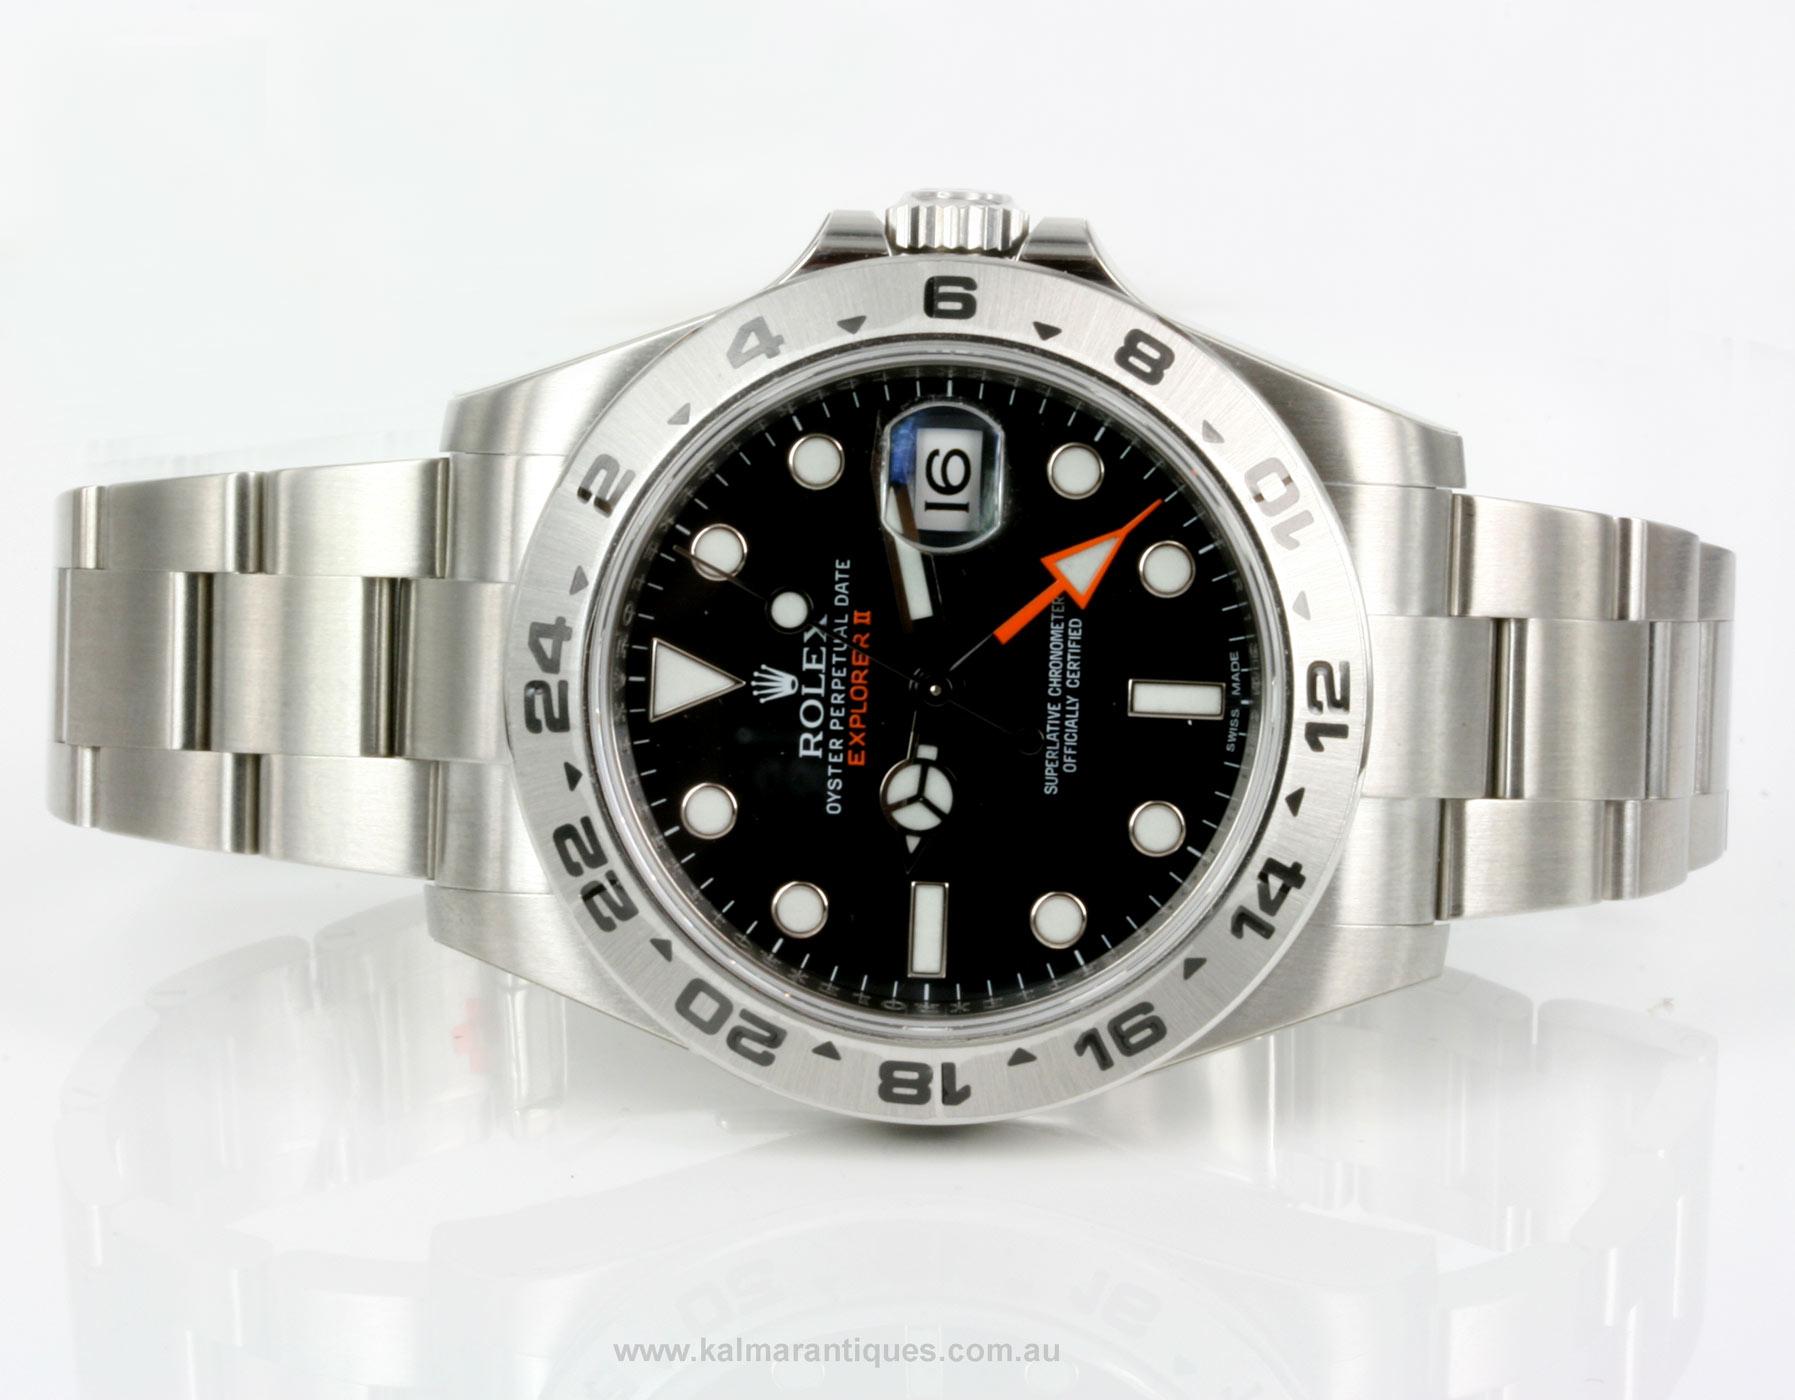 347ec7768a1 Buy Brand new 2013 Rolex Explorer II model 216570 Sold Items